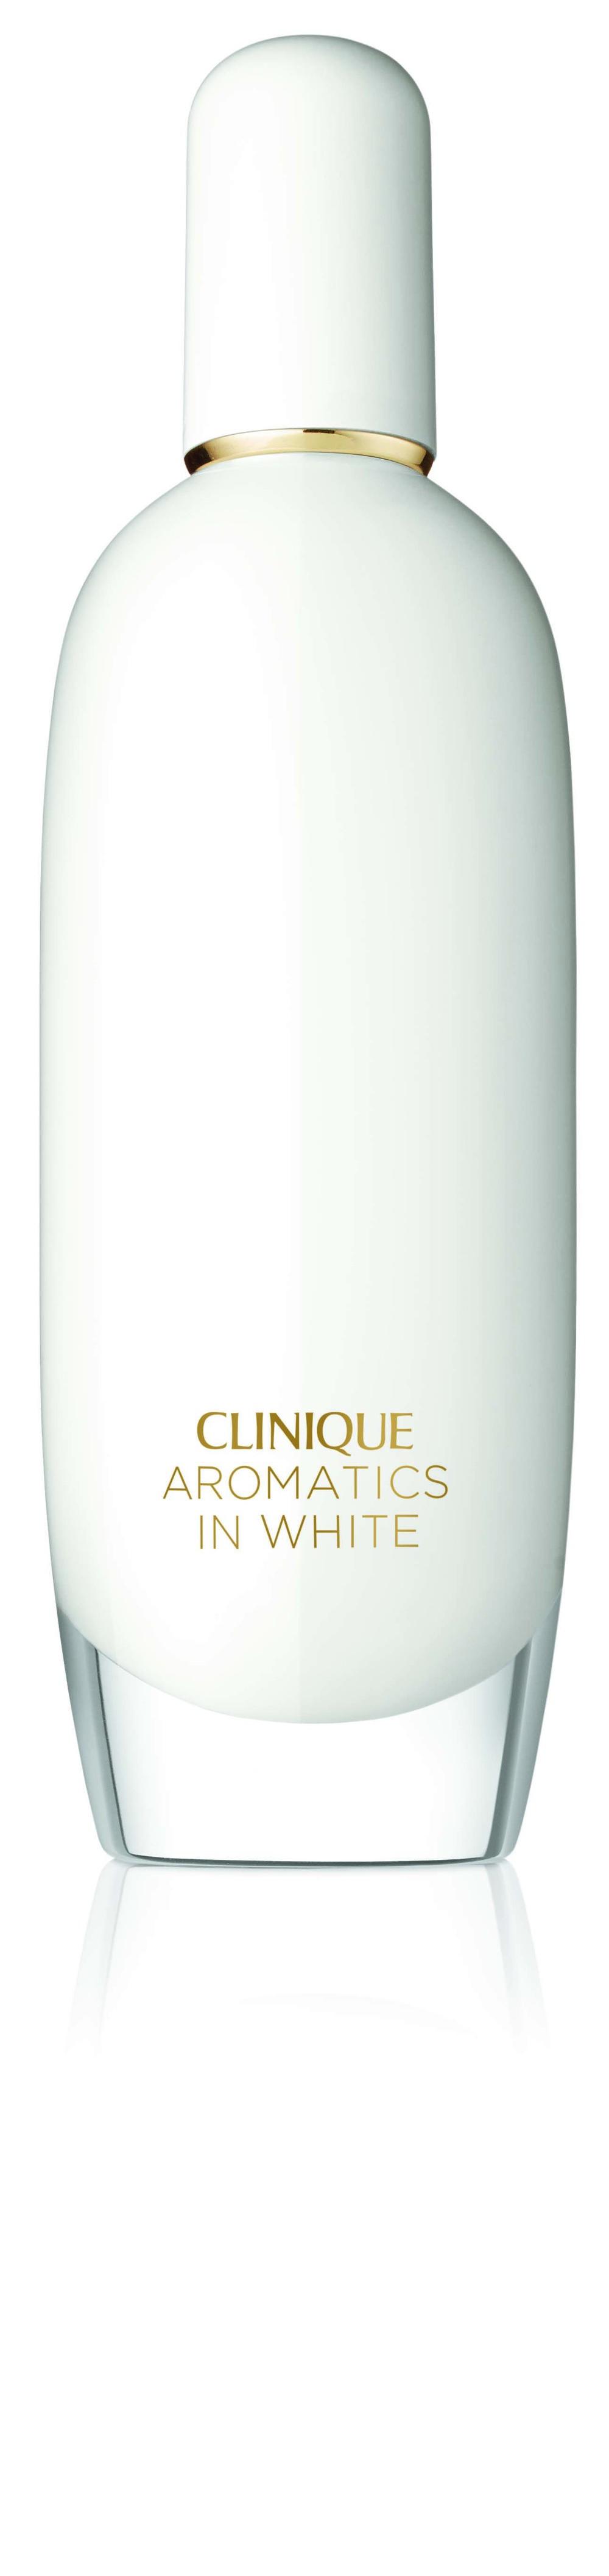 CLINIQUE Aromatics in White Deco GLOBAL ICON HI RES.jpg